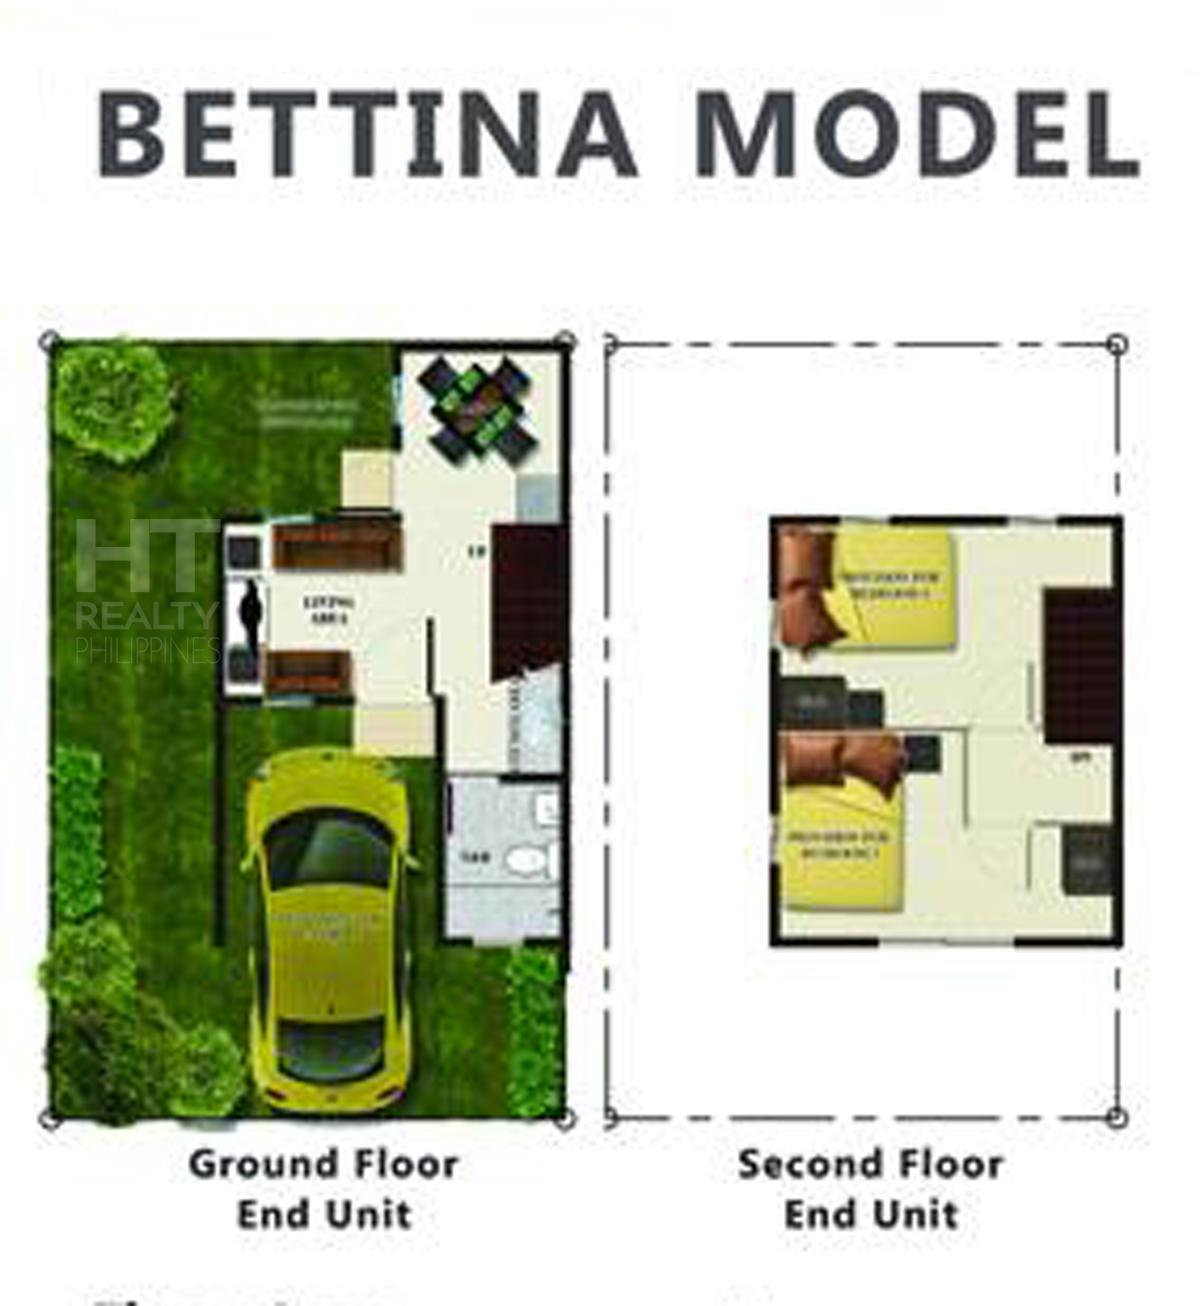 Bettina House Townhouse Bria Homes Davao Ht Realty Philippines